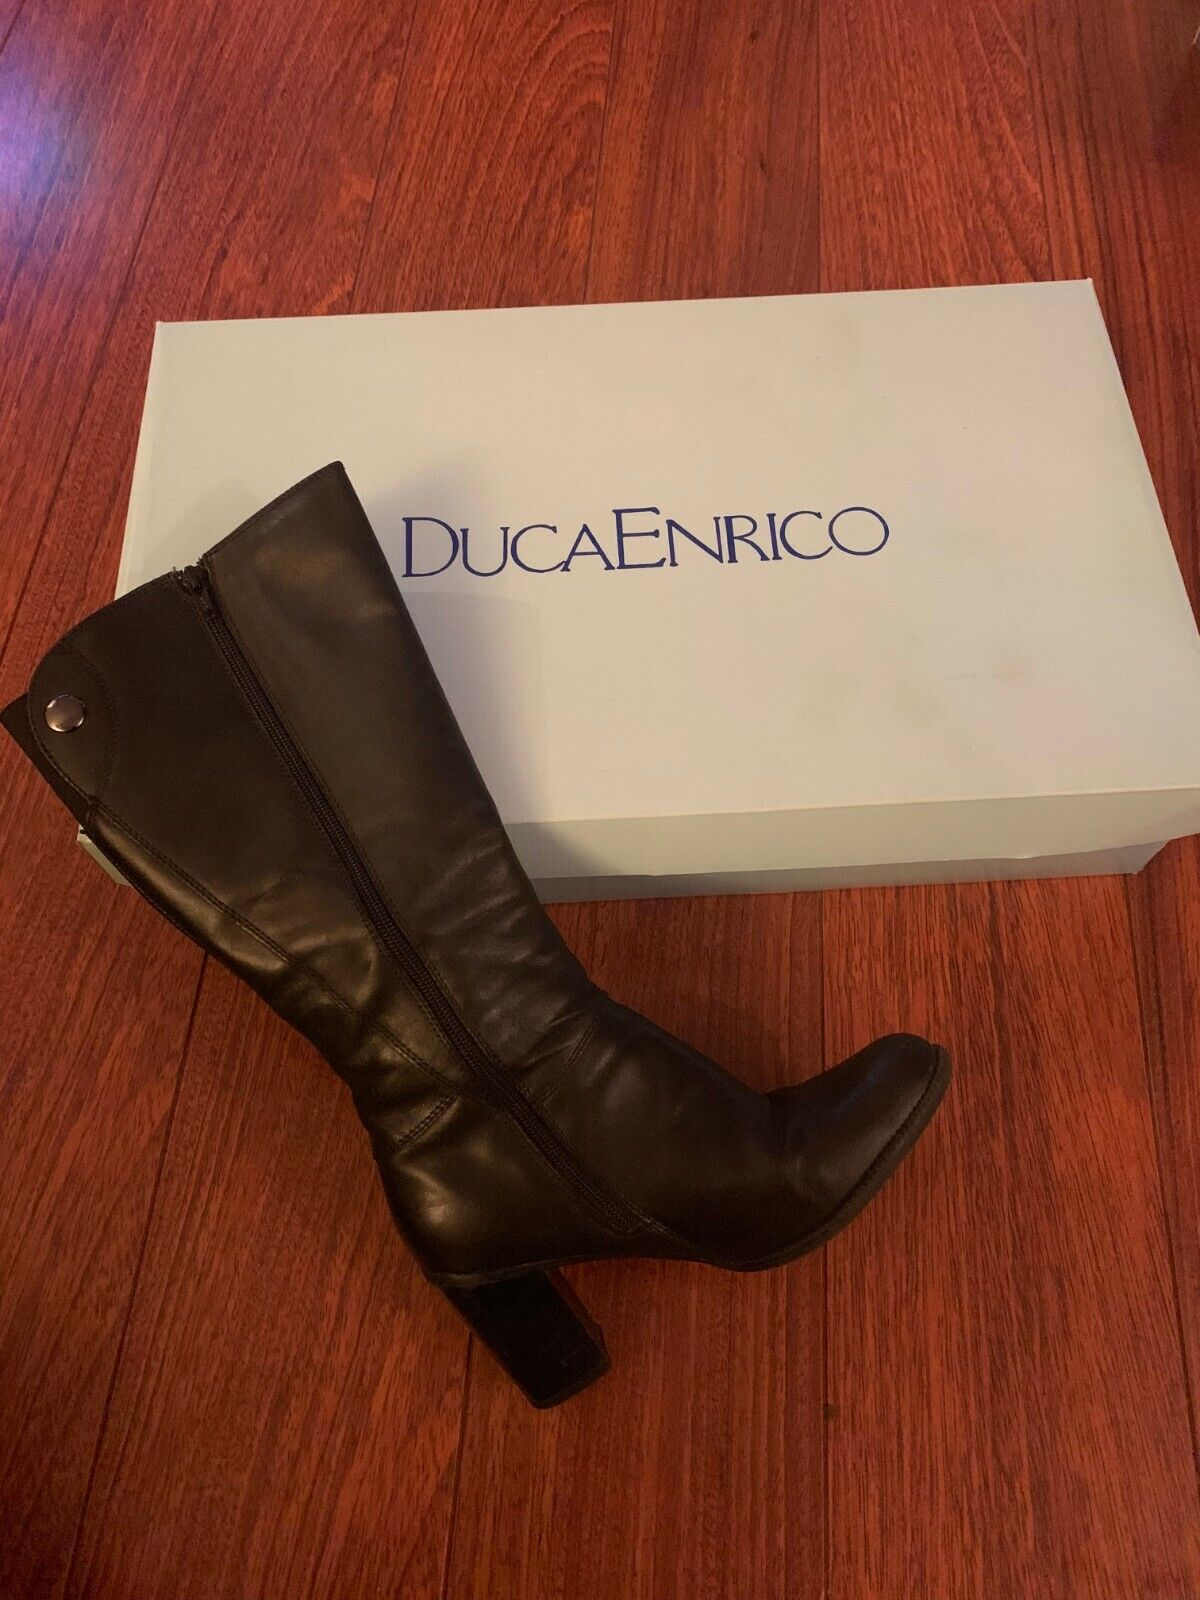 Enrico leather boots, size 4, excellent condition, RRP